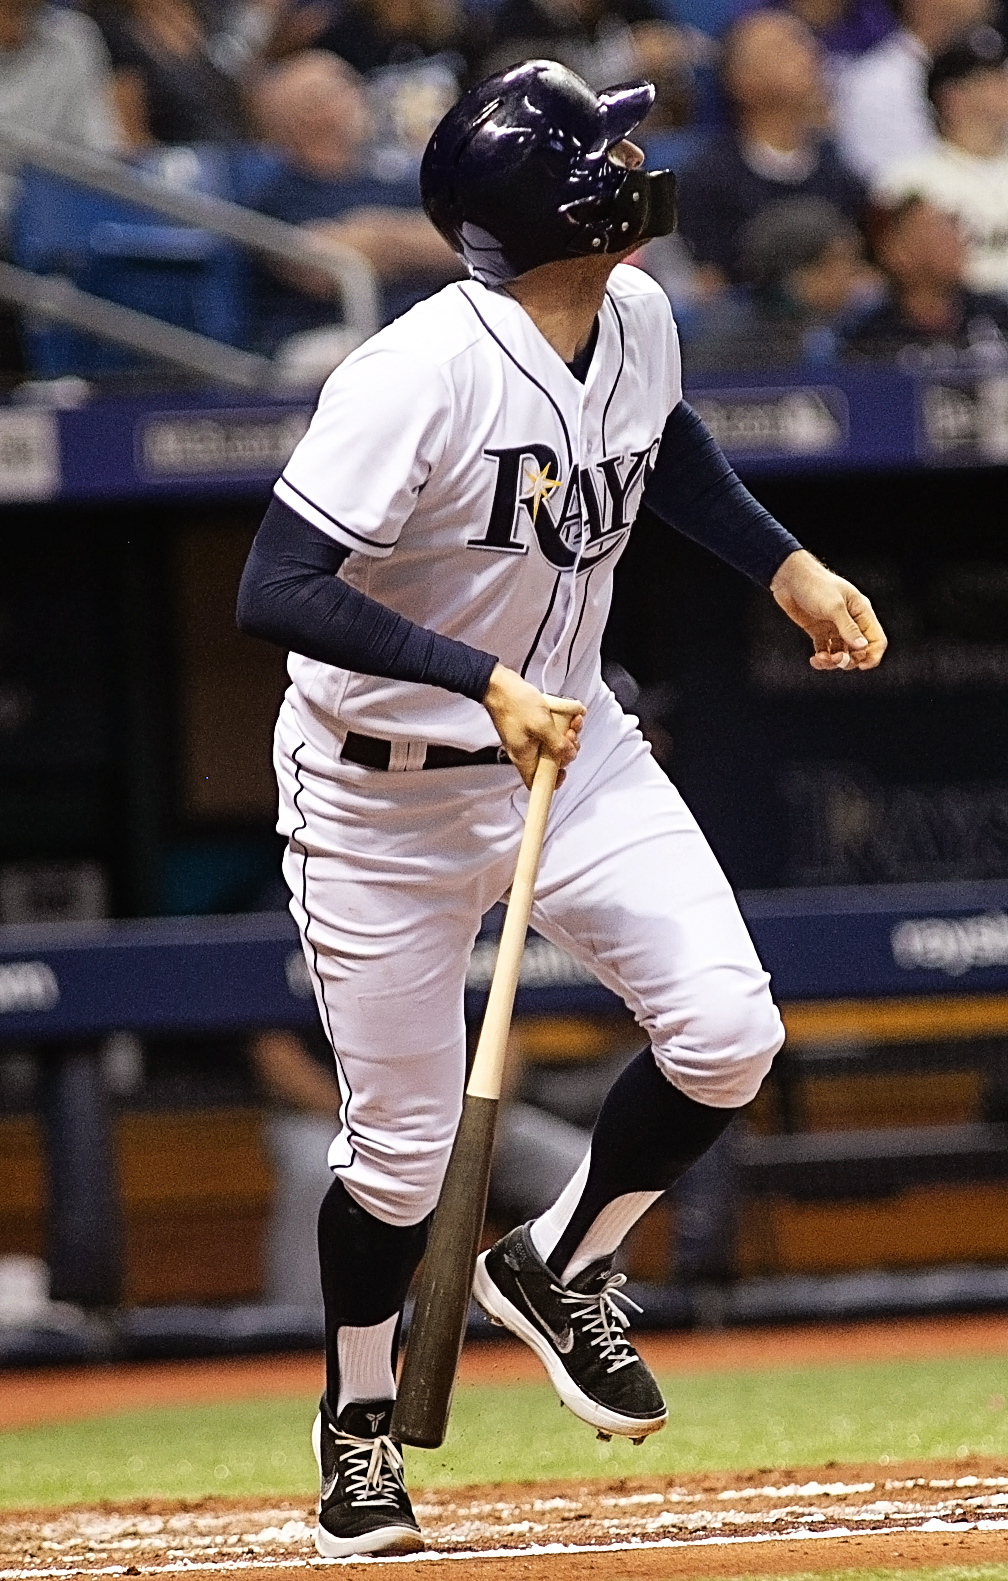 Miller had three hits for the Rays./CARMEN MANDATO